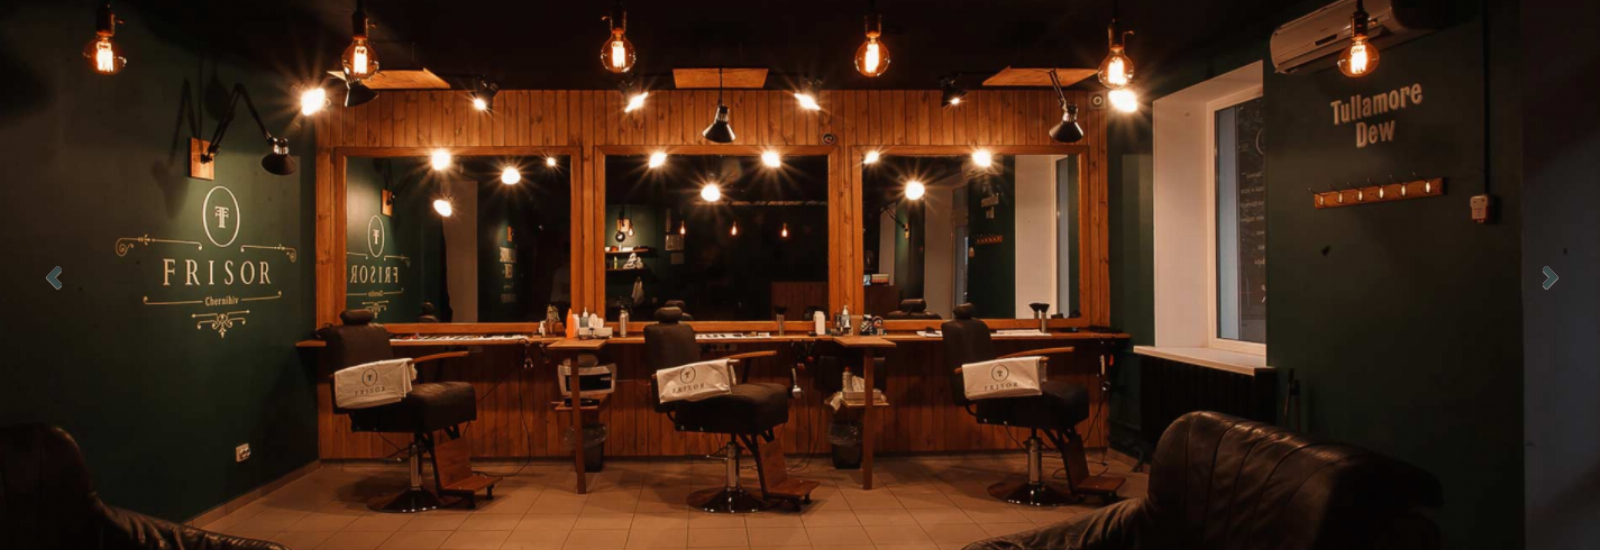 frisor barbershop